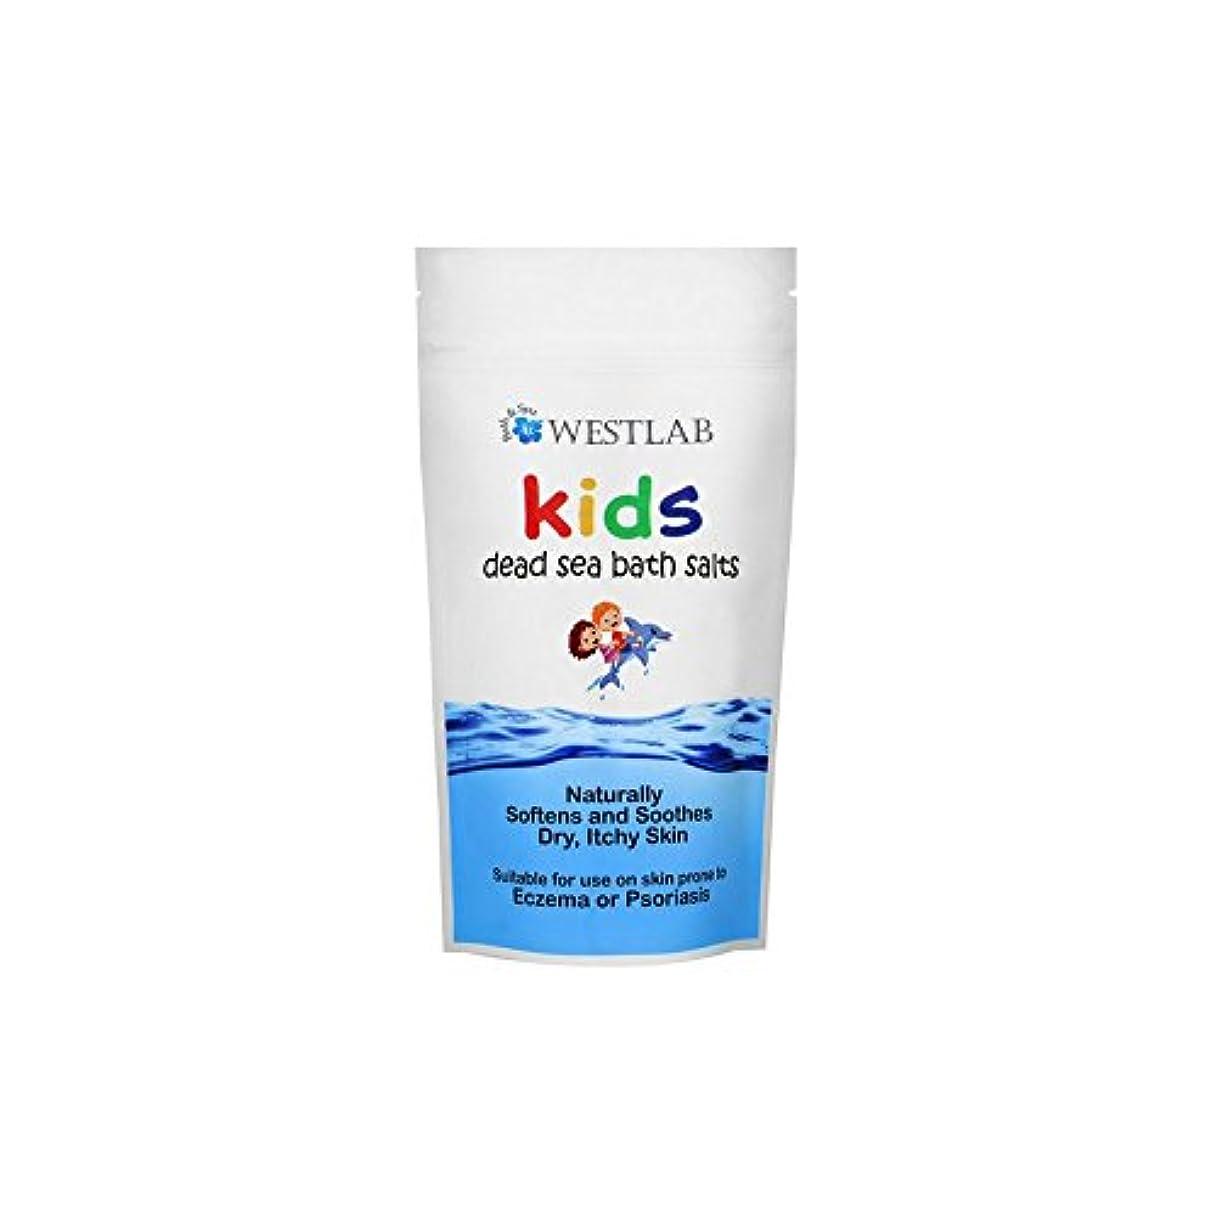 子供死海の塩 x4 - Westlab Kids Dead Sea Salt (Pack of 4) [並行輸入品]